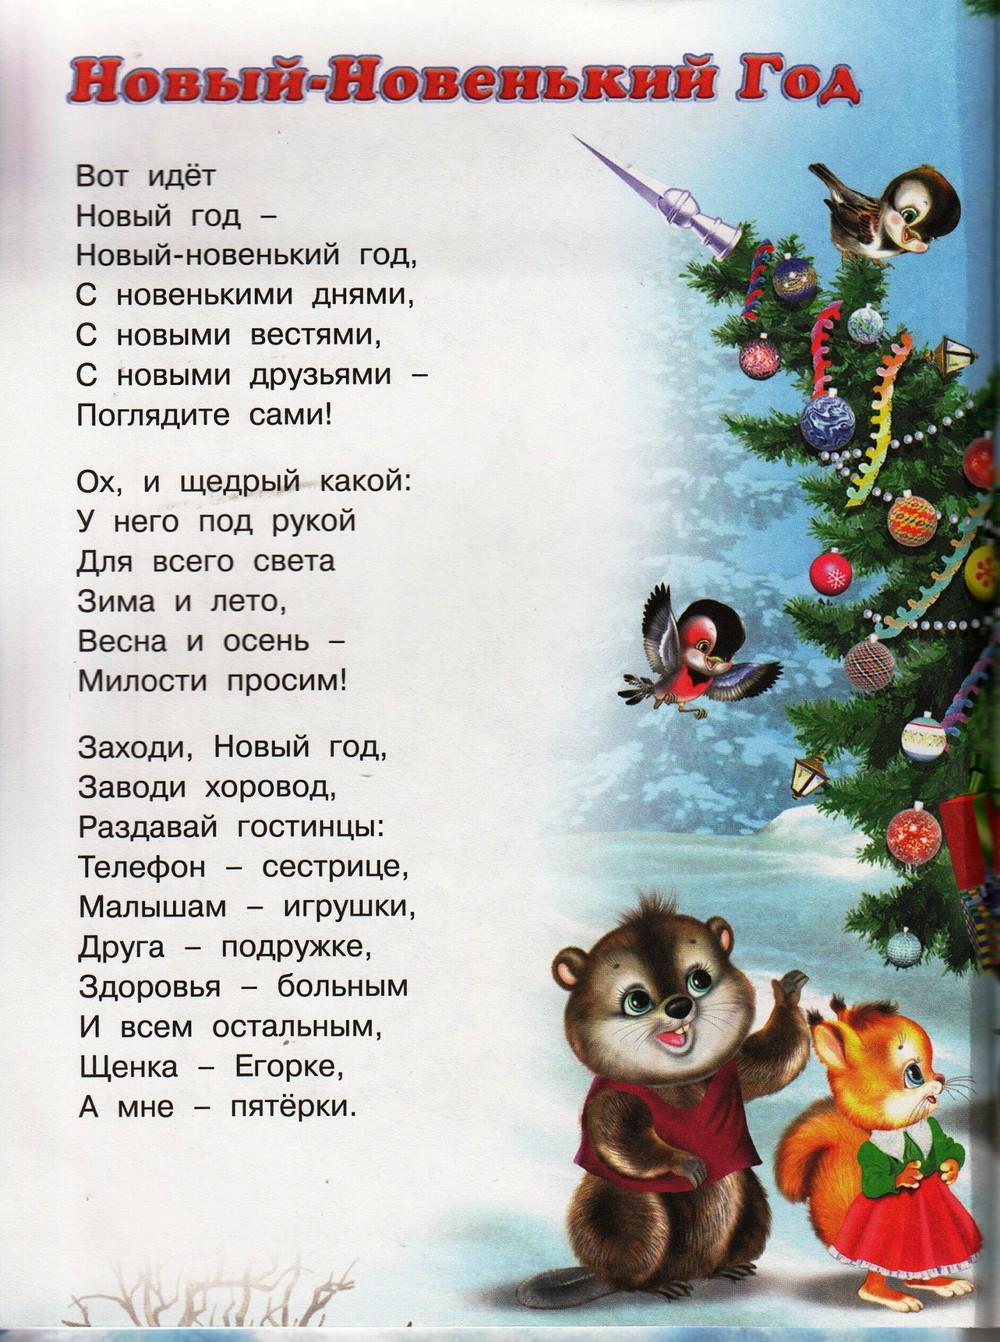 http://i1.imageban.ru/out/2013/12/19/8d2c2c4b7a26aa1d23209eaca932b128.jpg